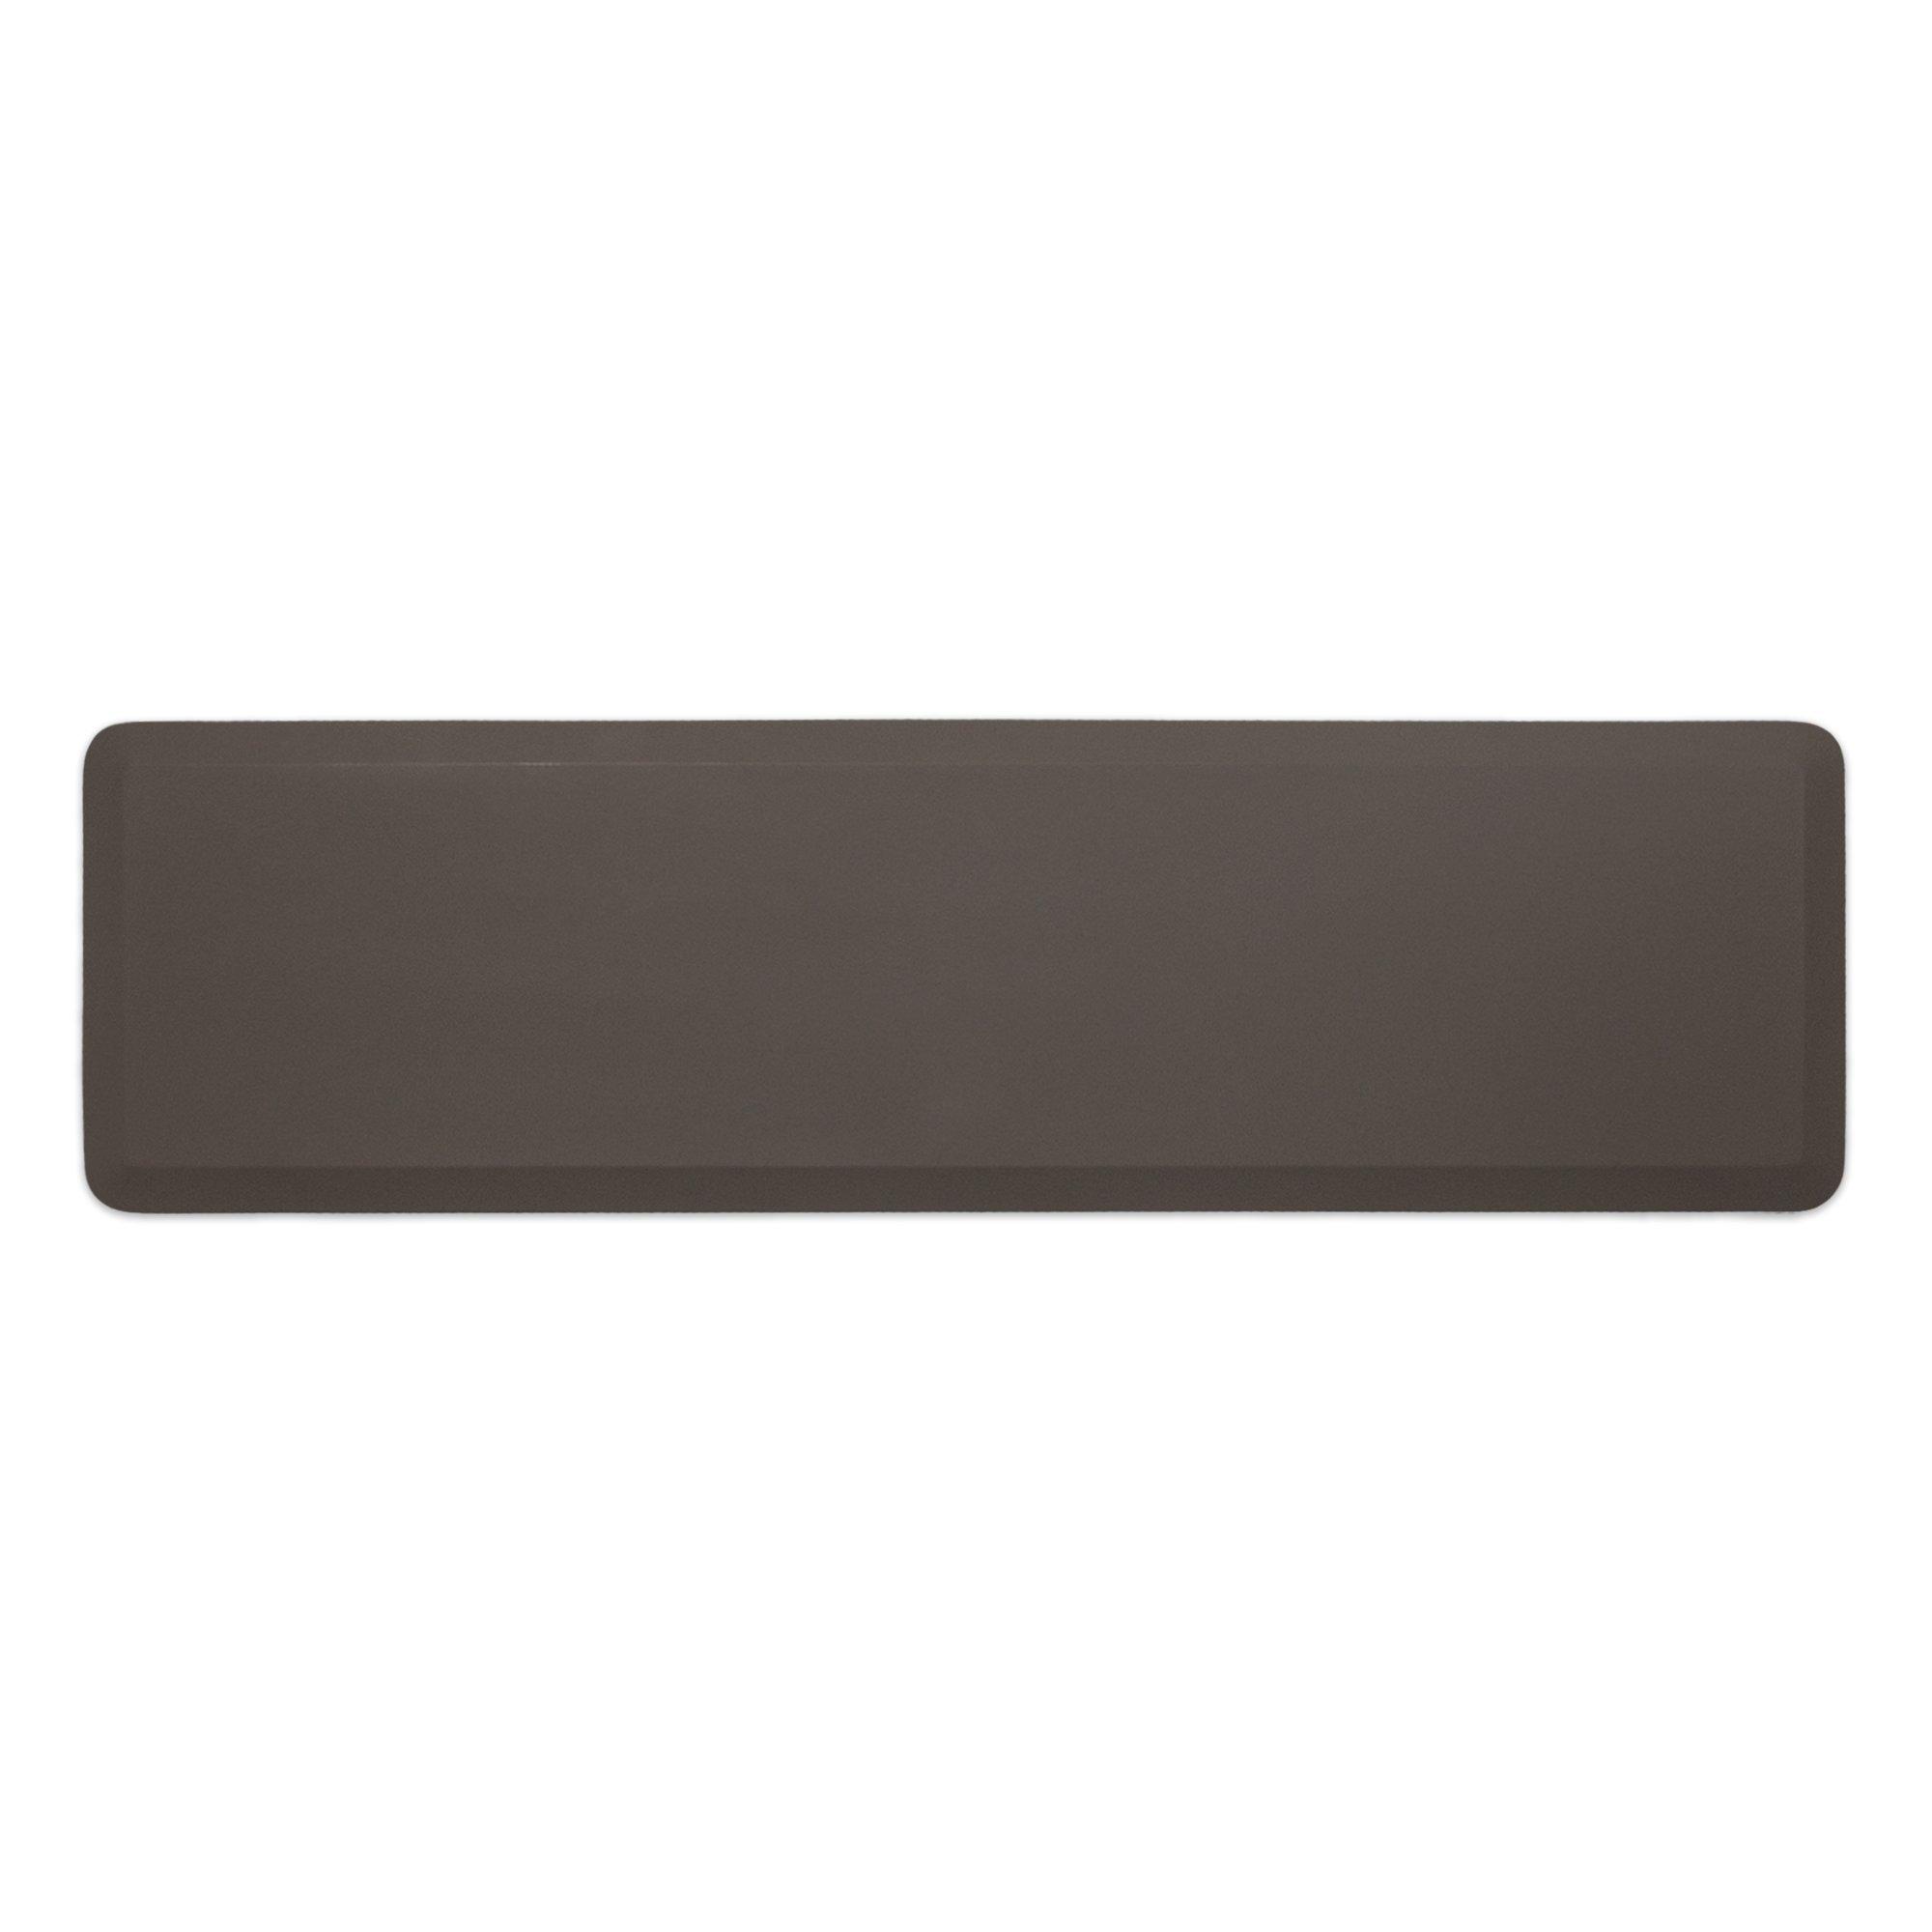 "NewLife by GelPro Professional Grade Anti-Fatigue Kitchen & Office Comfort Mat, 20x72, Stone ¾"" Bio-Foam Mat with non-slip bottom for health & wellness"